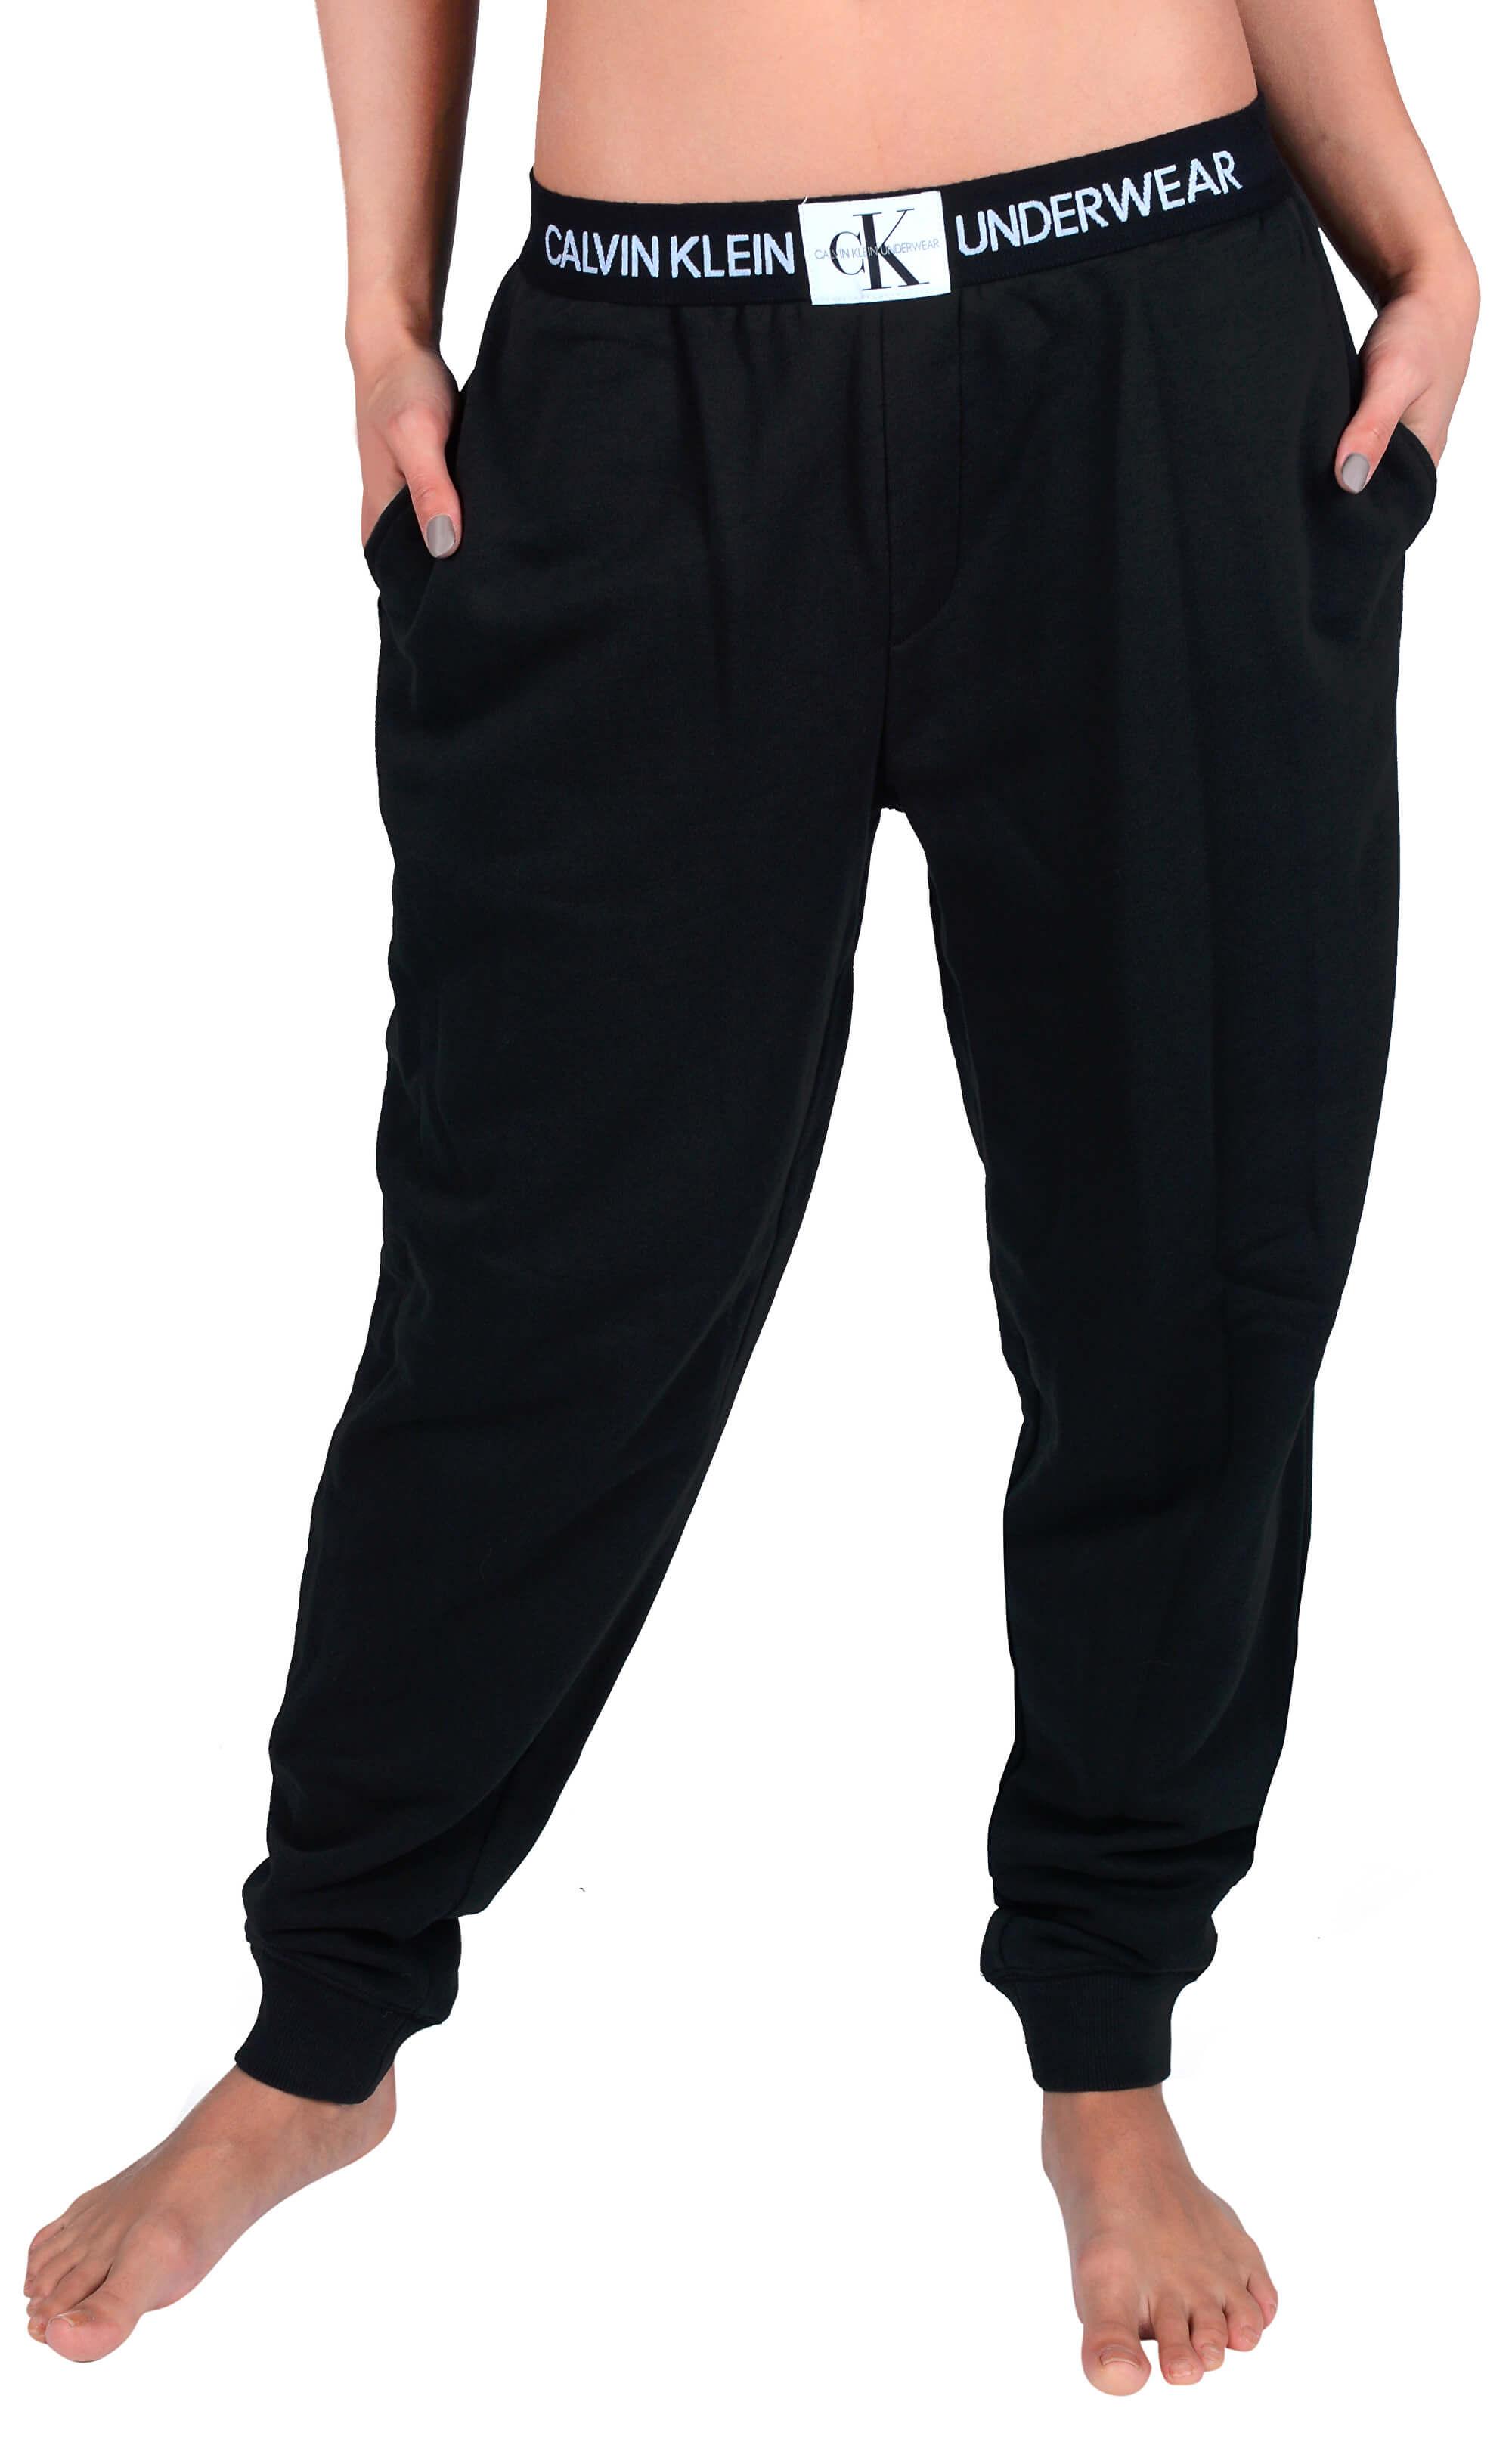 0baf2b6359f Calvin Klein Dámské tepláky Jogger Black QS6031E-001 Doprava ZDARMA ...